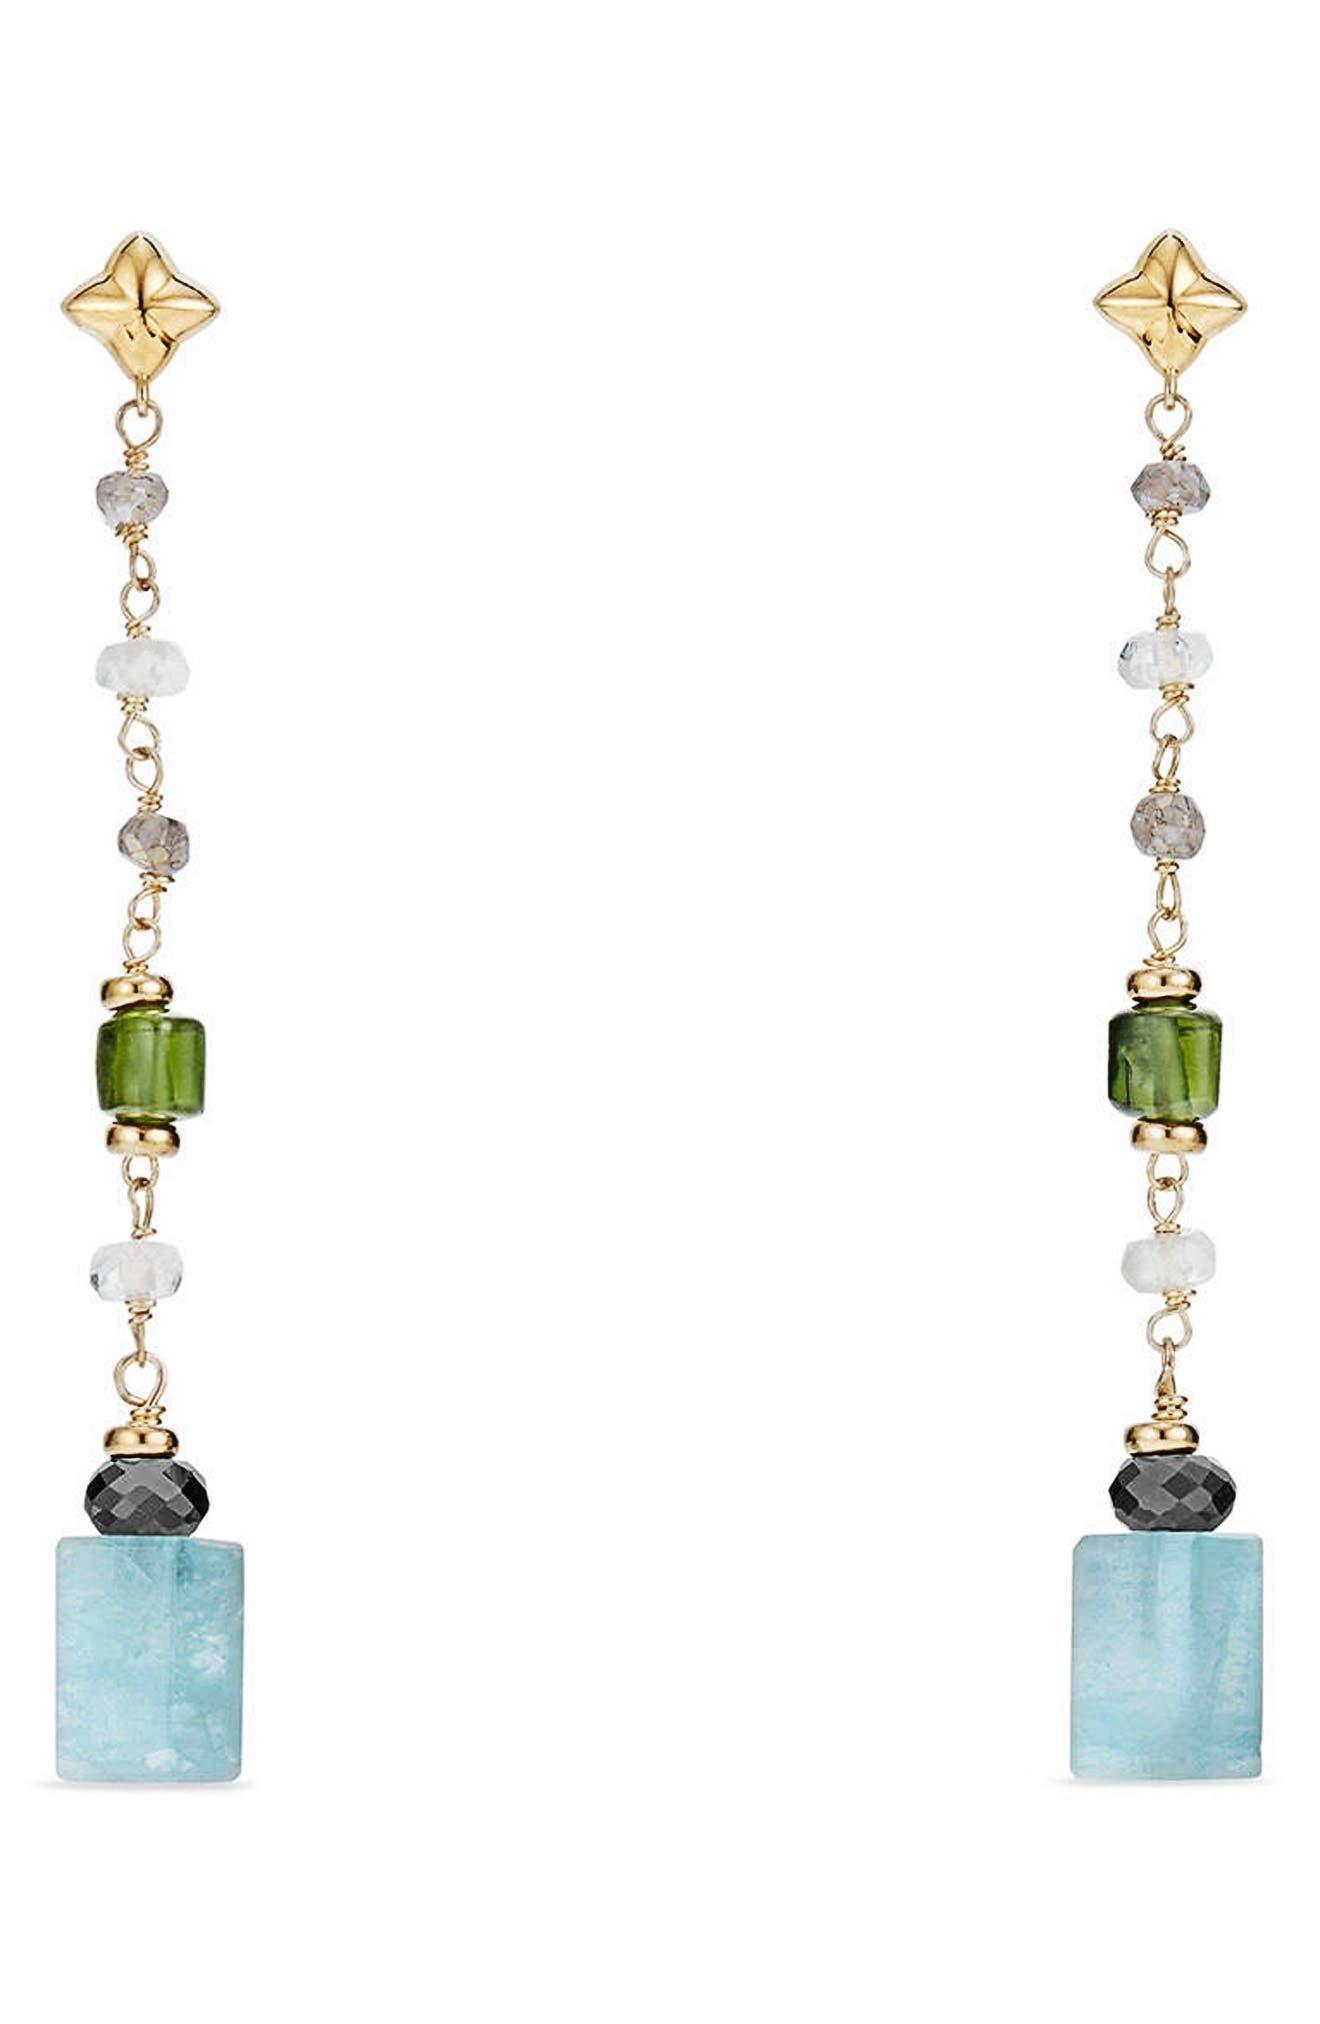 Bead & Chain Earrings with Semiprecious Stones,                             Main thumbnail 1, color,                             Aquamarine